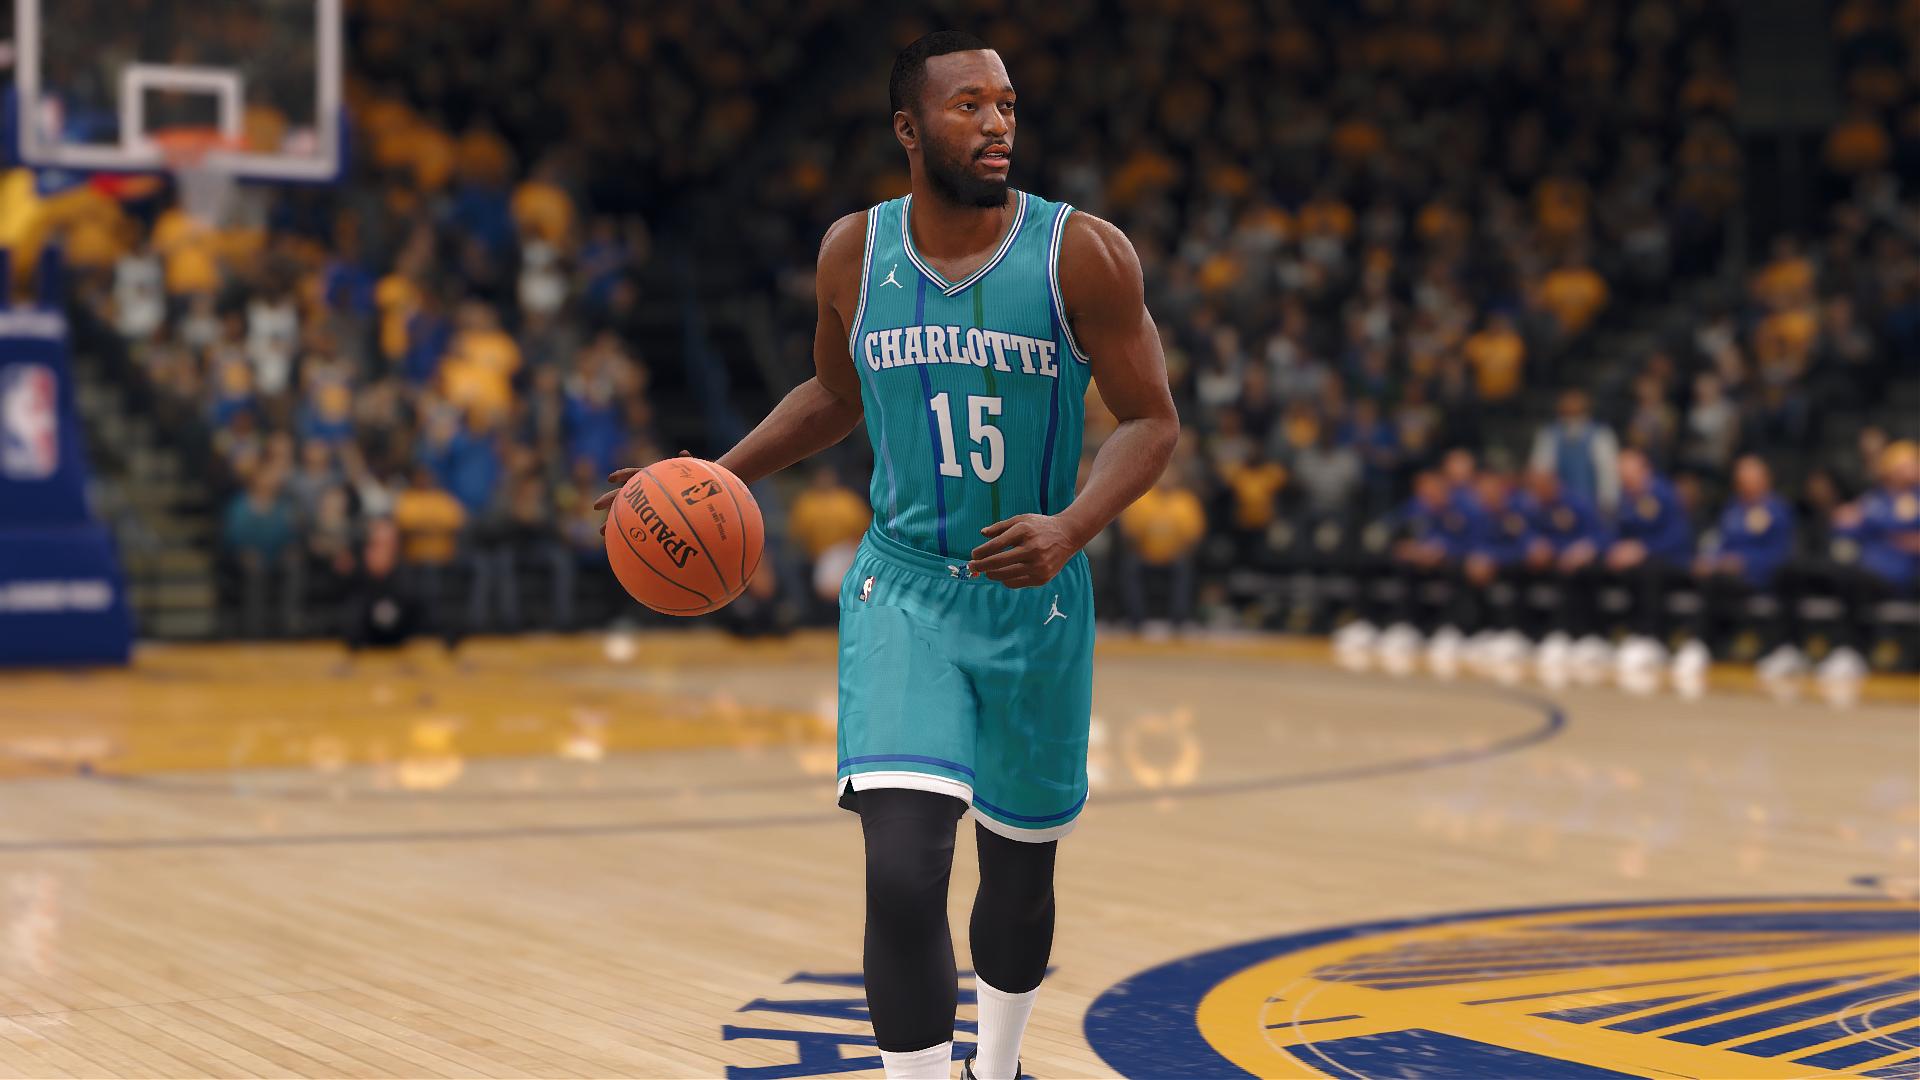 ff89a4b5888 New NBA Live 18 Roster Adds Classic Uniforms